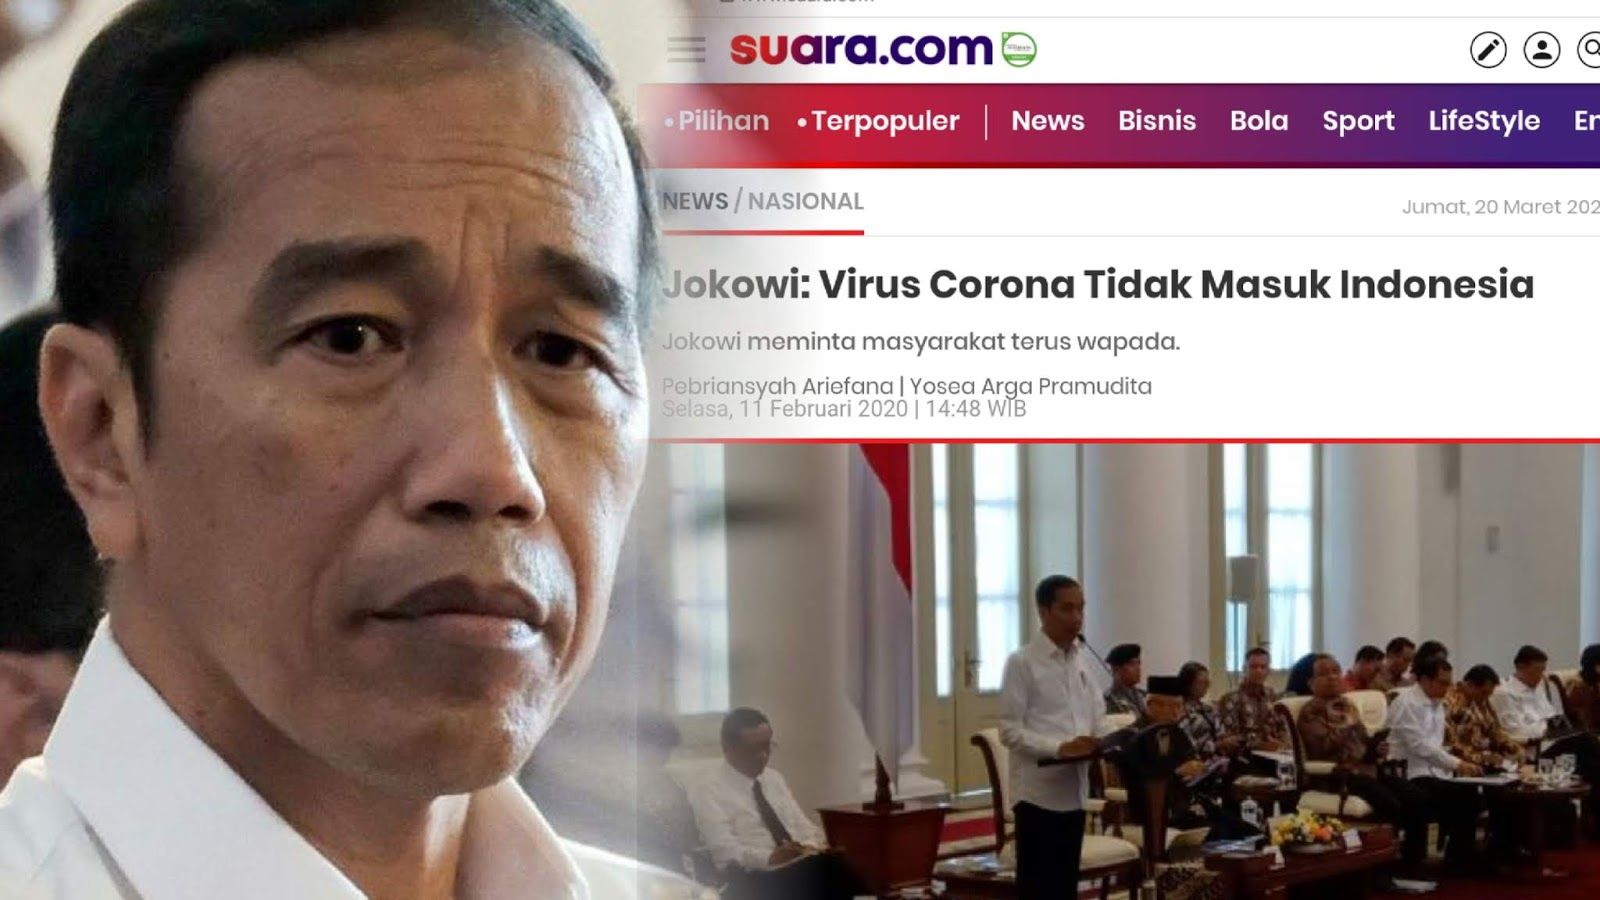 Mengenang Jejak Jokowi yang Yakin Virus Corona Tidak Masuk Indonesia